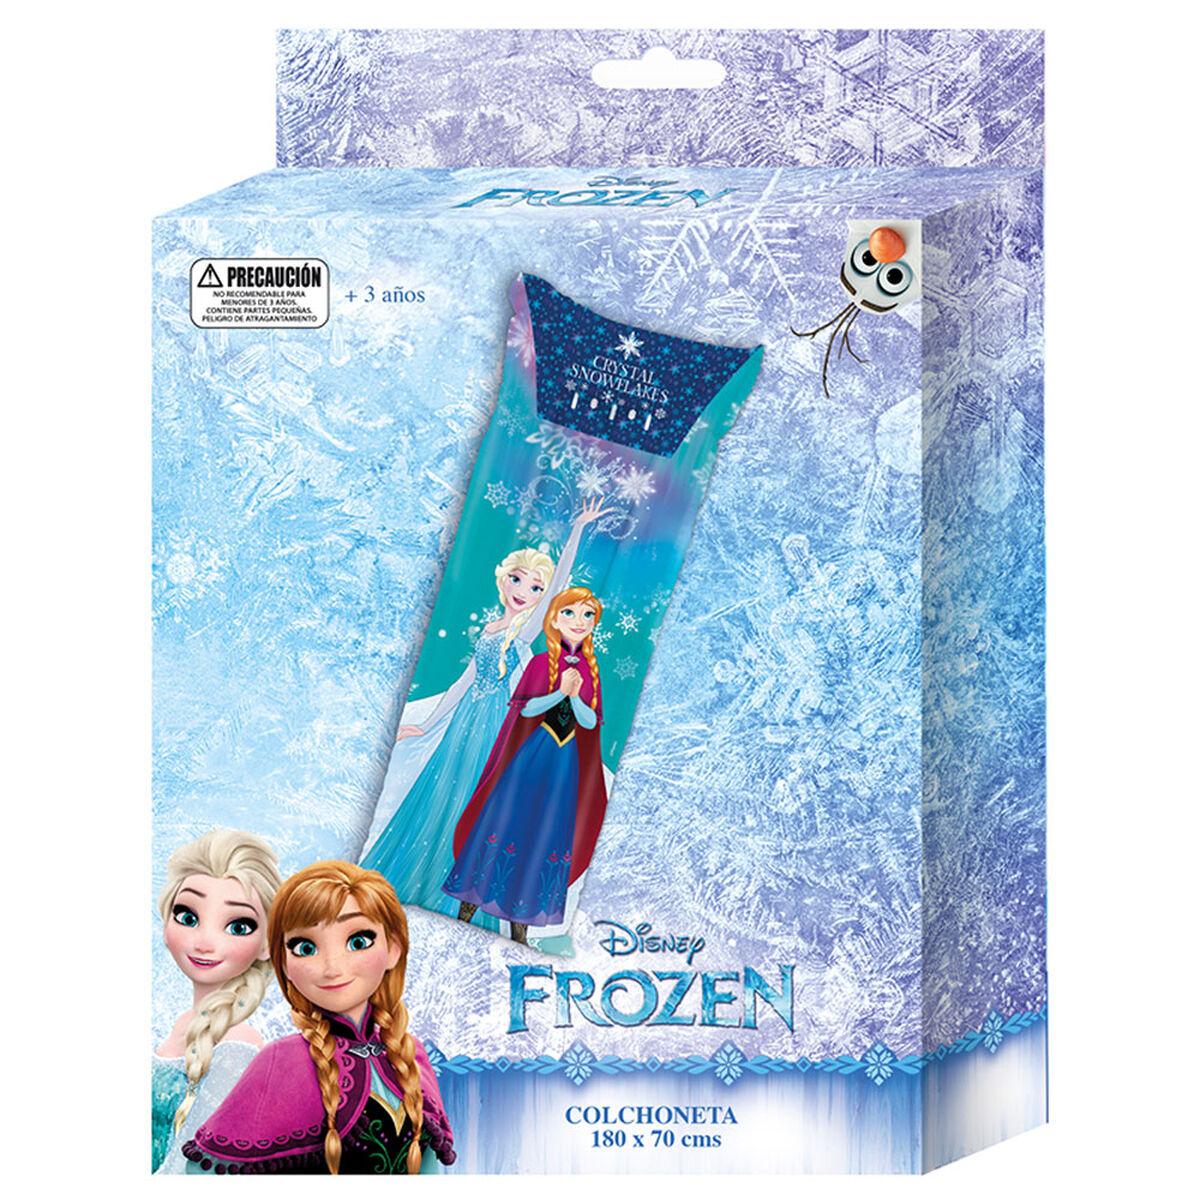 Colchoneta 180 X 70 Cms Frozen Disney